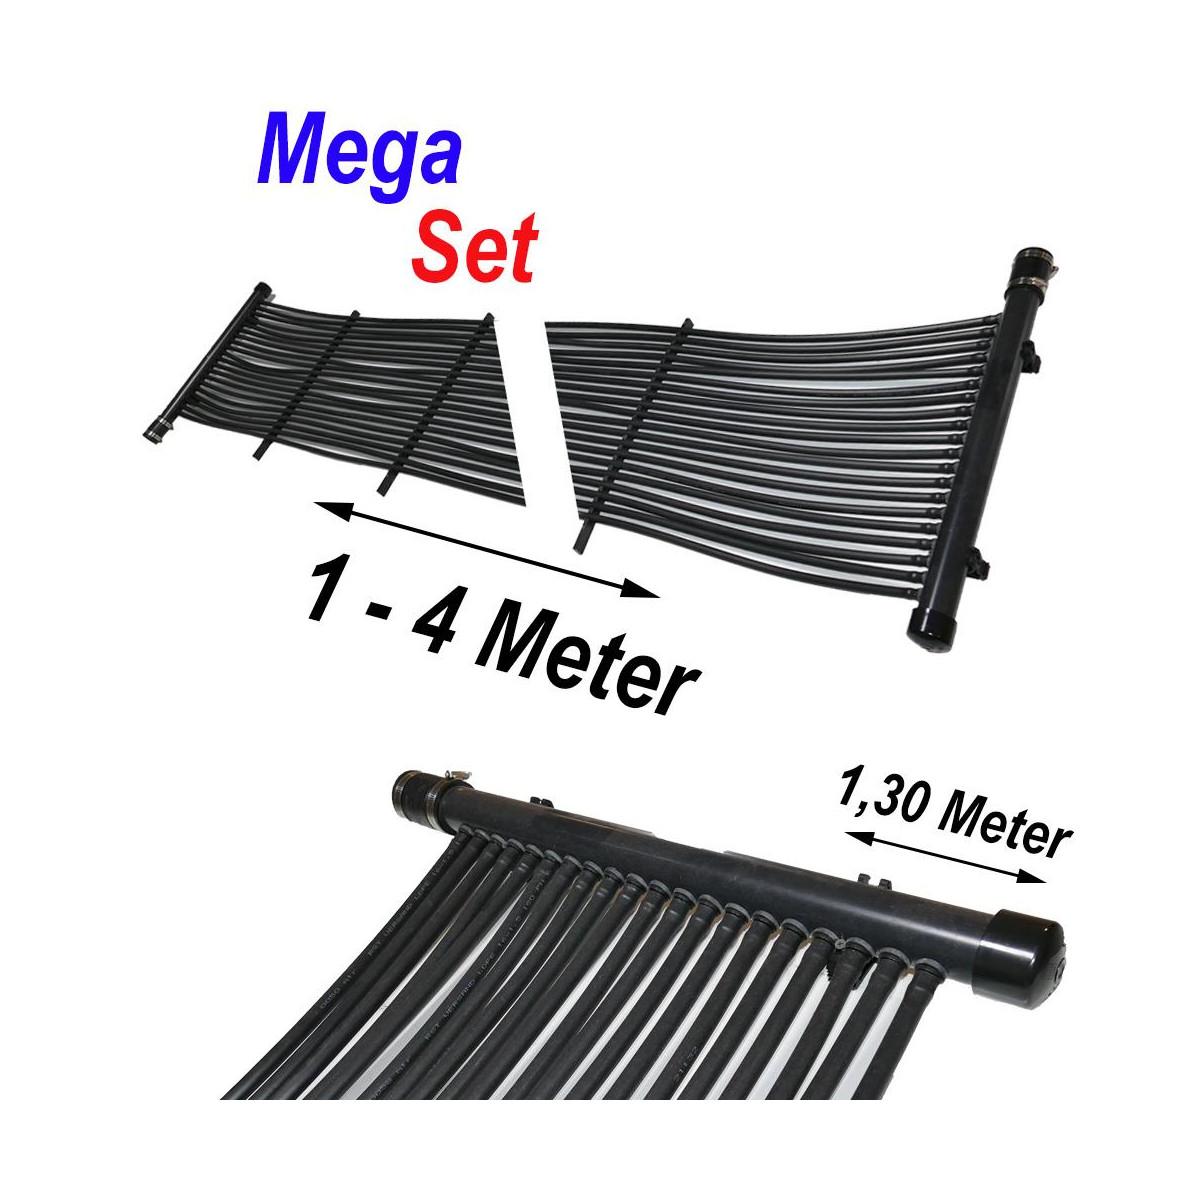 RST-VERSAND (Eigenmarke) Poolheizung Solarmatte MegaSet 4,80 m² (160 Meter)